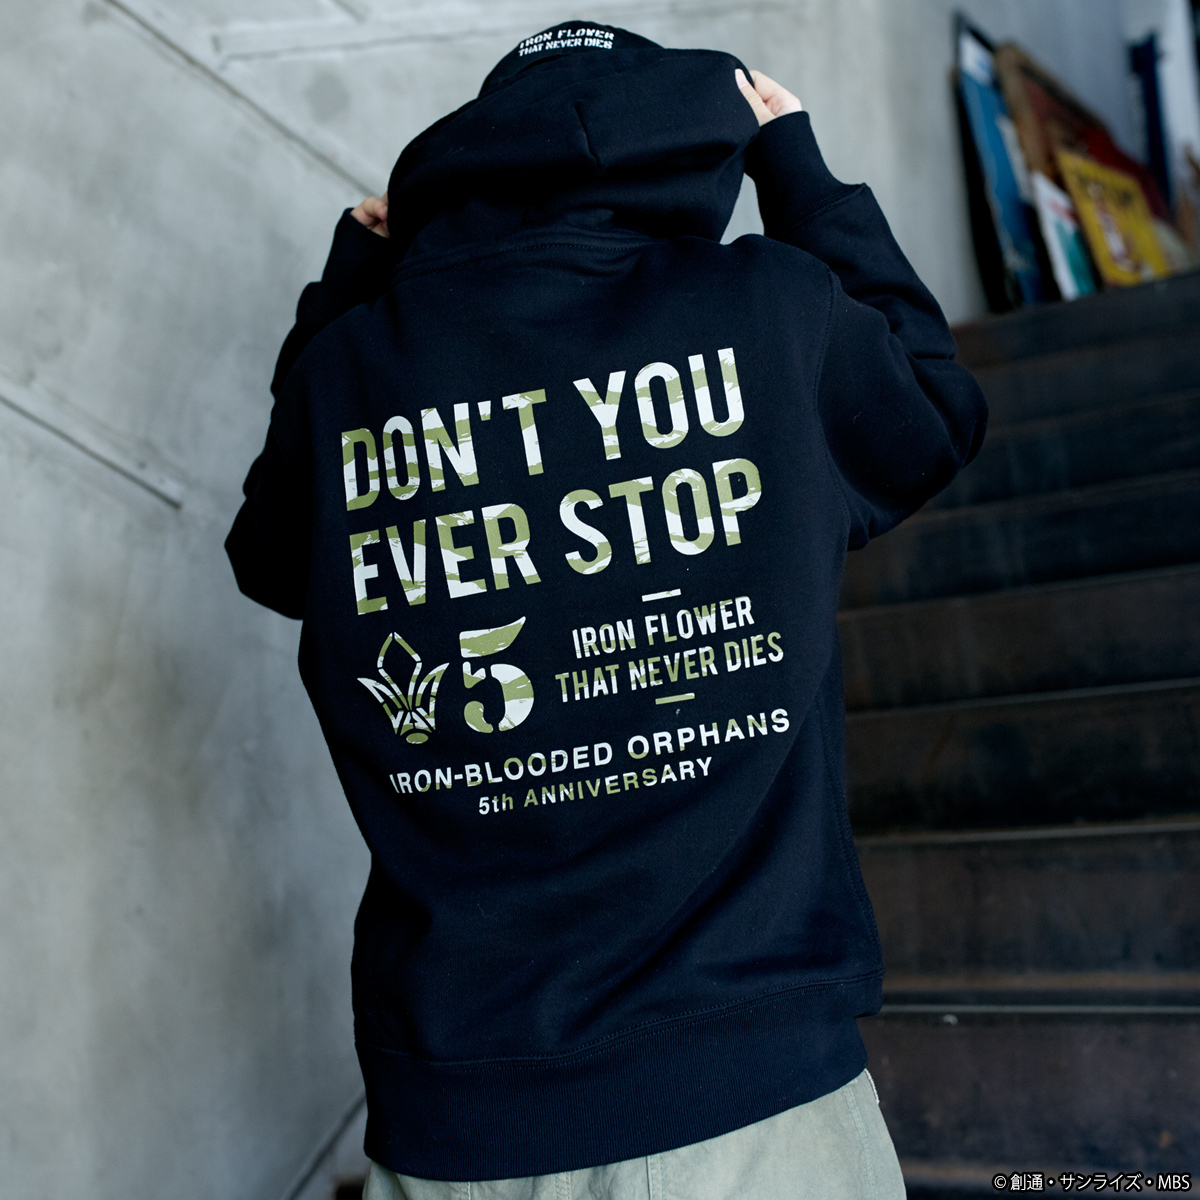 STRICT-G『機動戦士ガンダム 鉄血のオルフェンズ』 パーカー 5周年記念